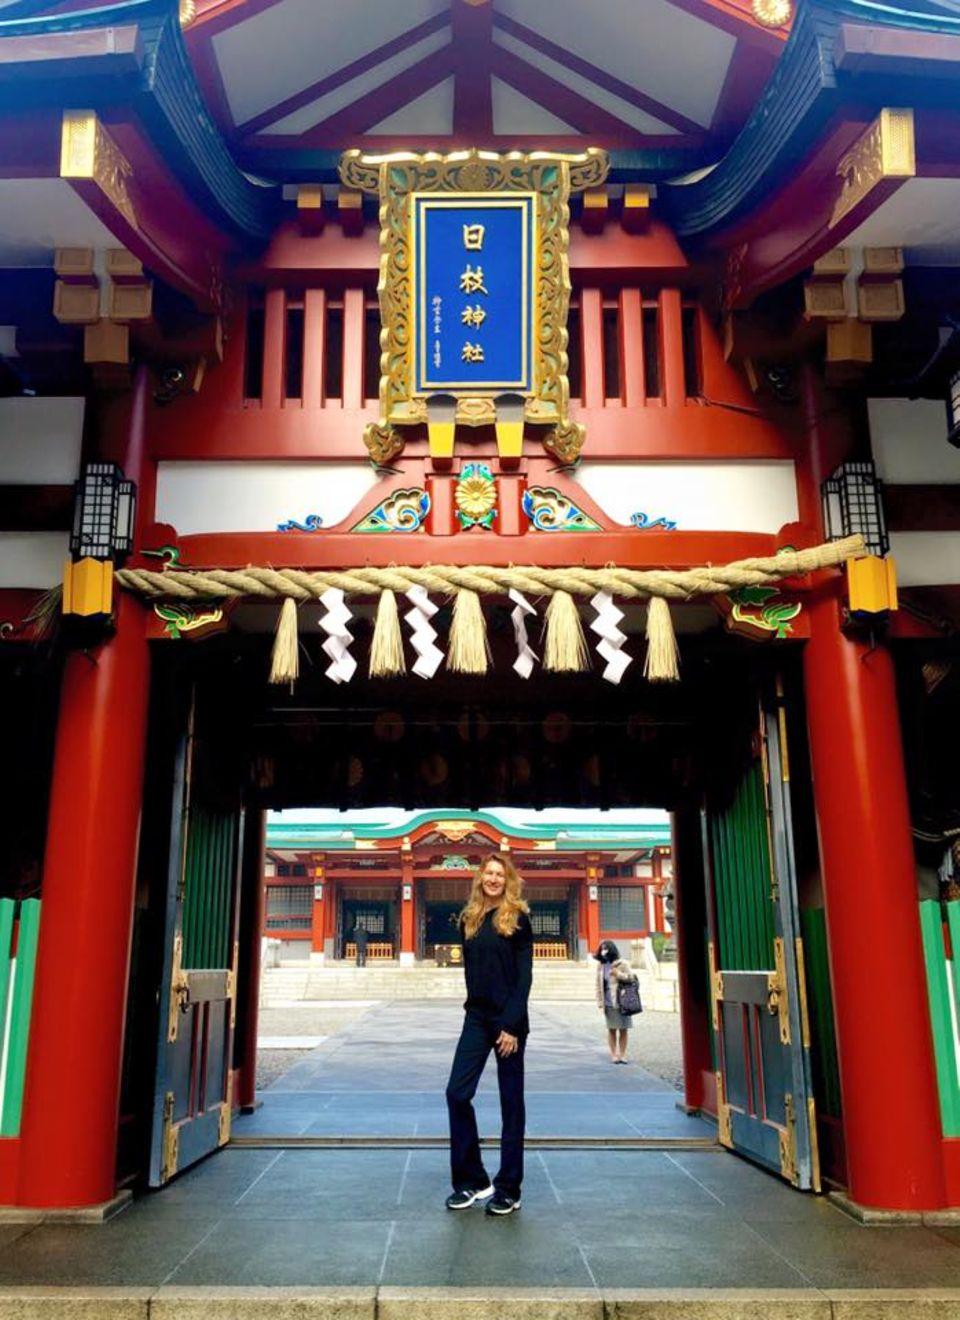 März 2016  Via Facebook sendet Steffi Graf Grüße aus Tokyo.